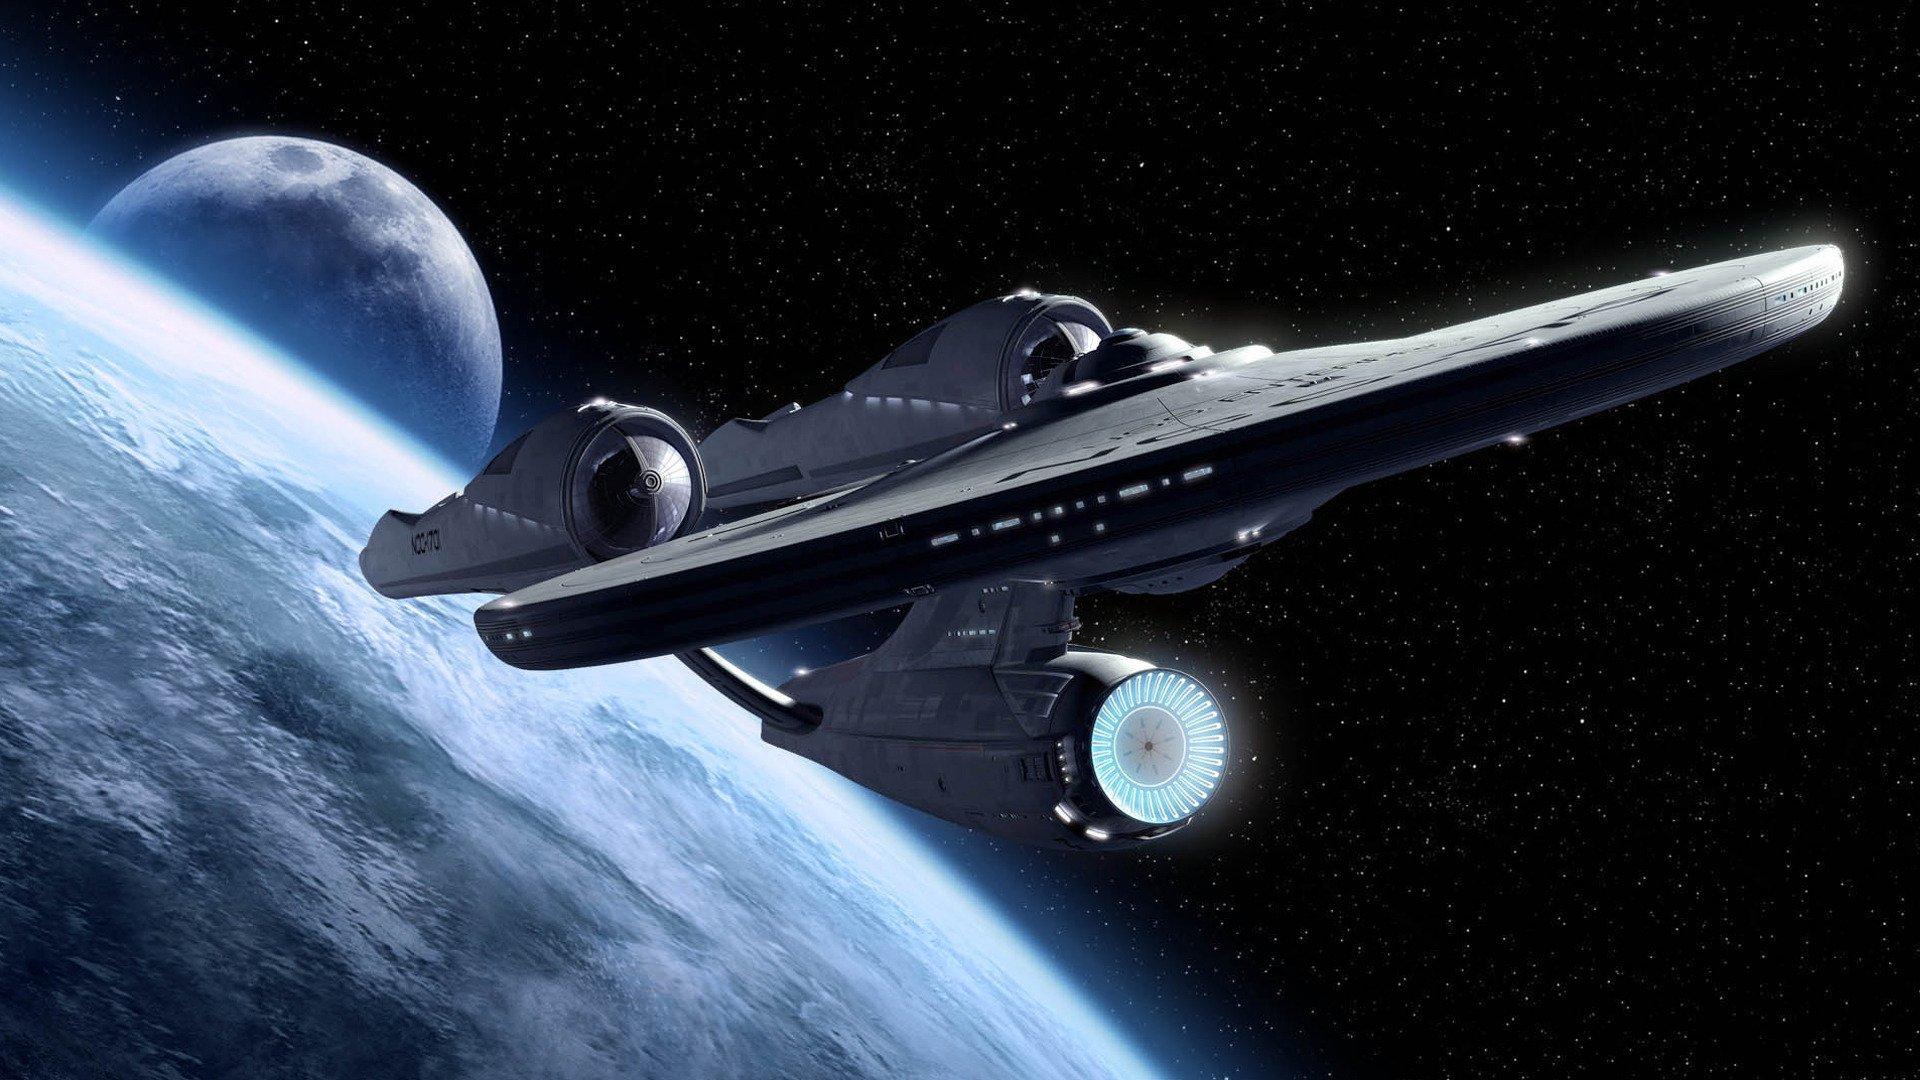 star-trek-into-darkness-enterprise-wallpaper-hd-background-wallpaper-18